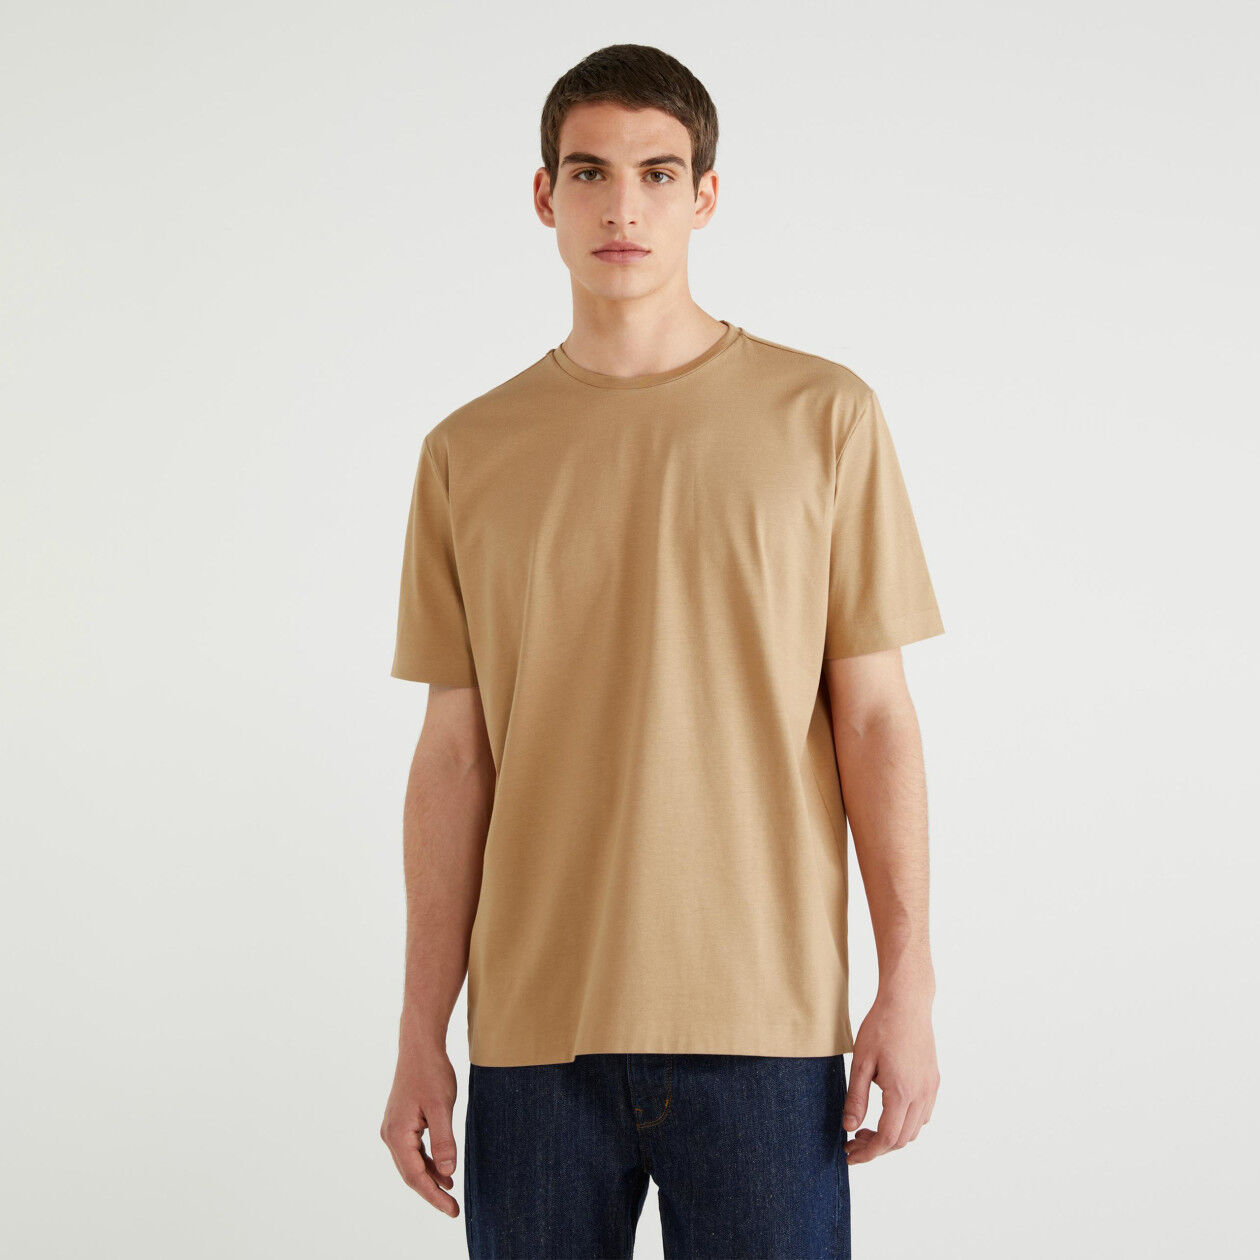 T-shirt κοντομάνικο 100% βαμβακερό